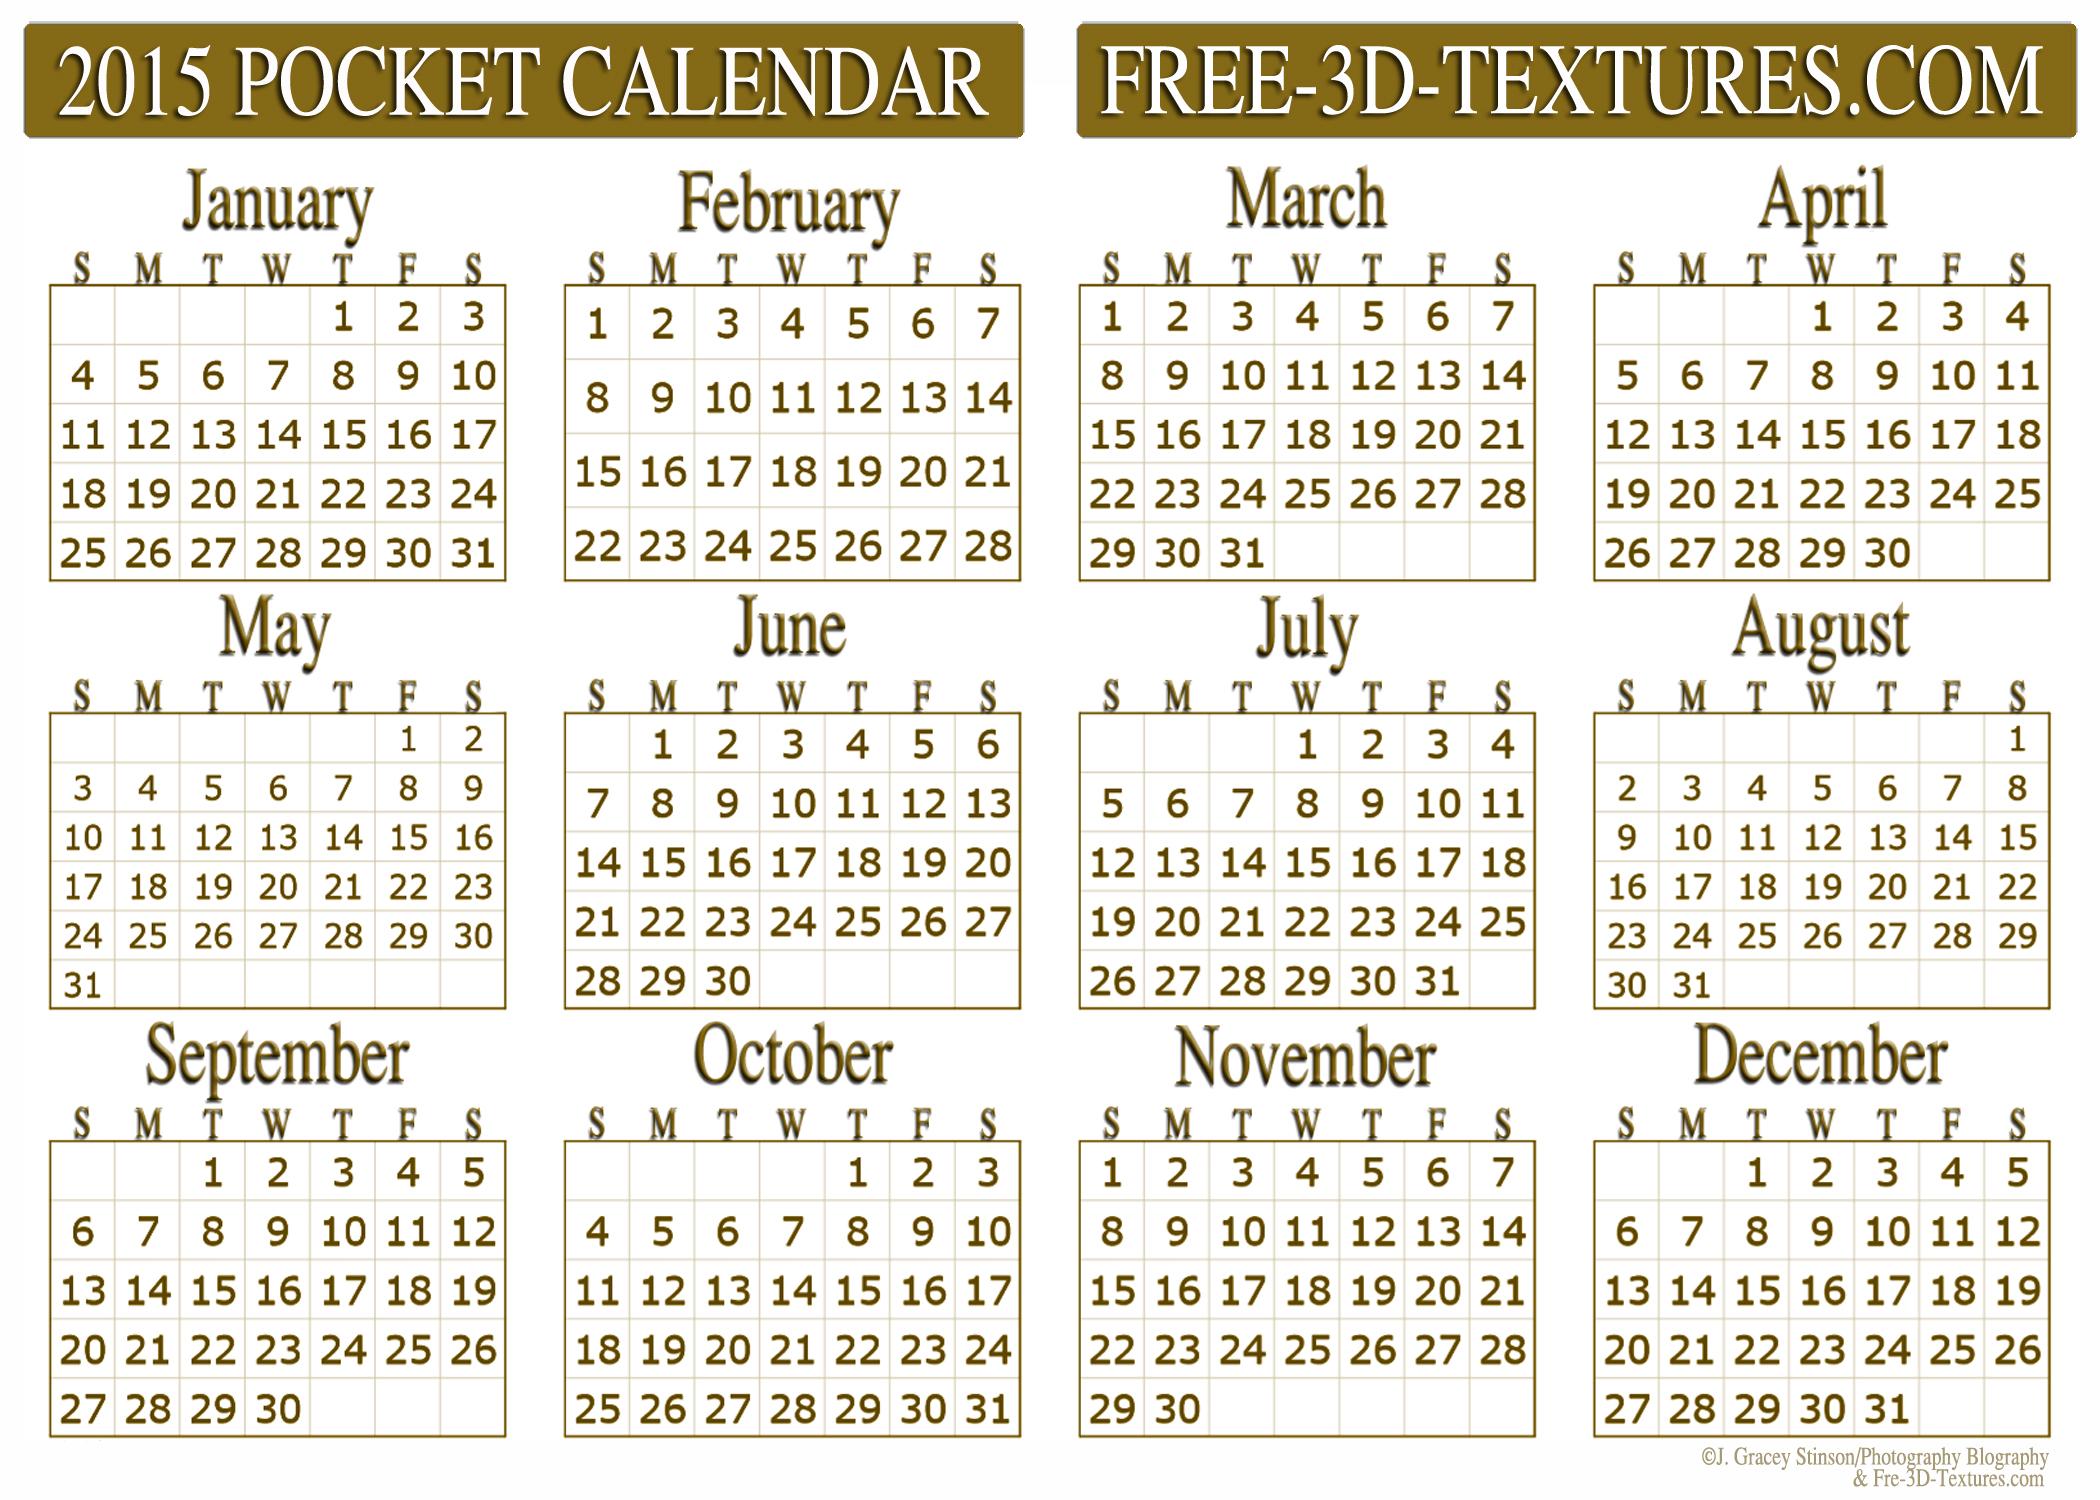 2015 Pocket Calendar Printable